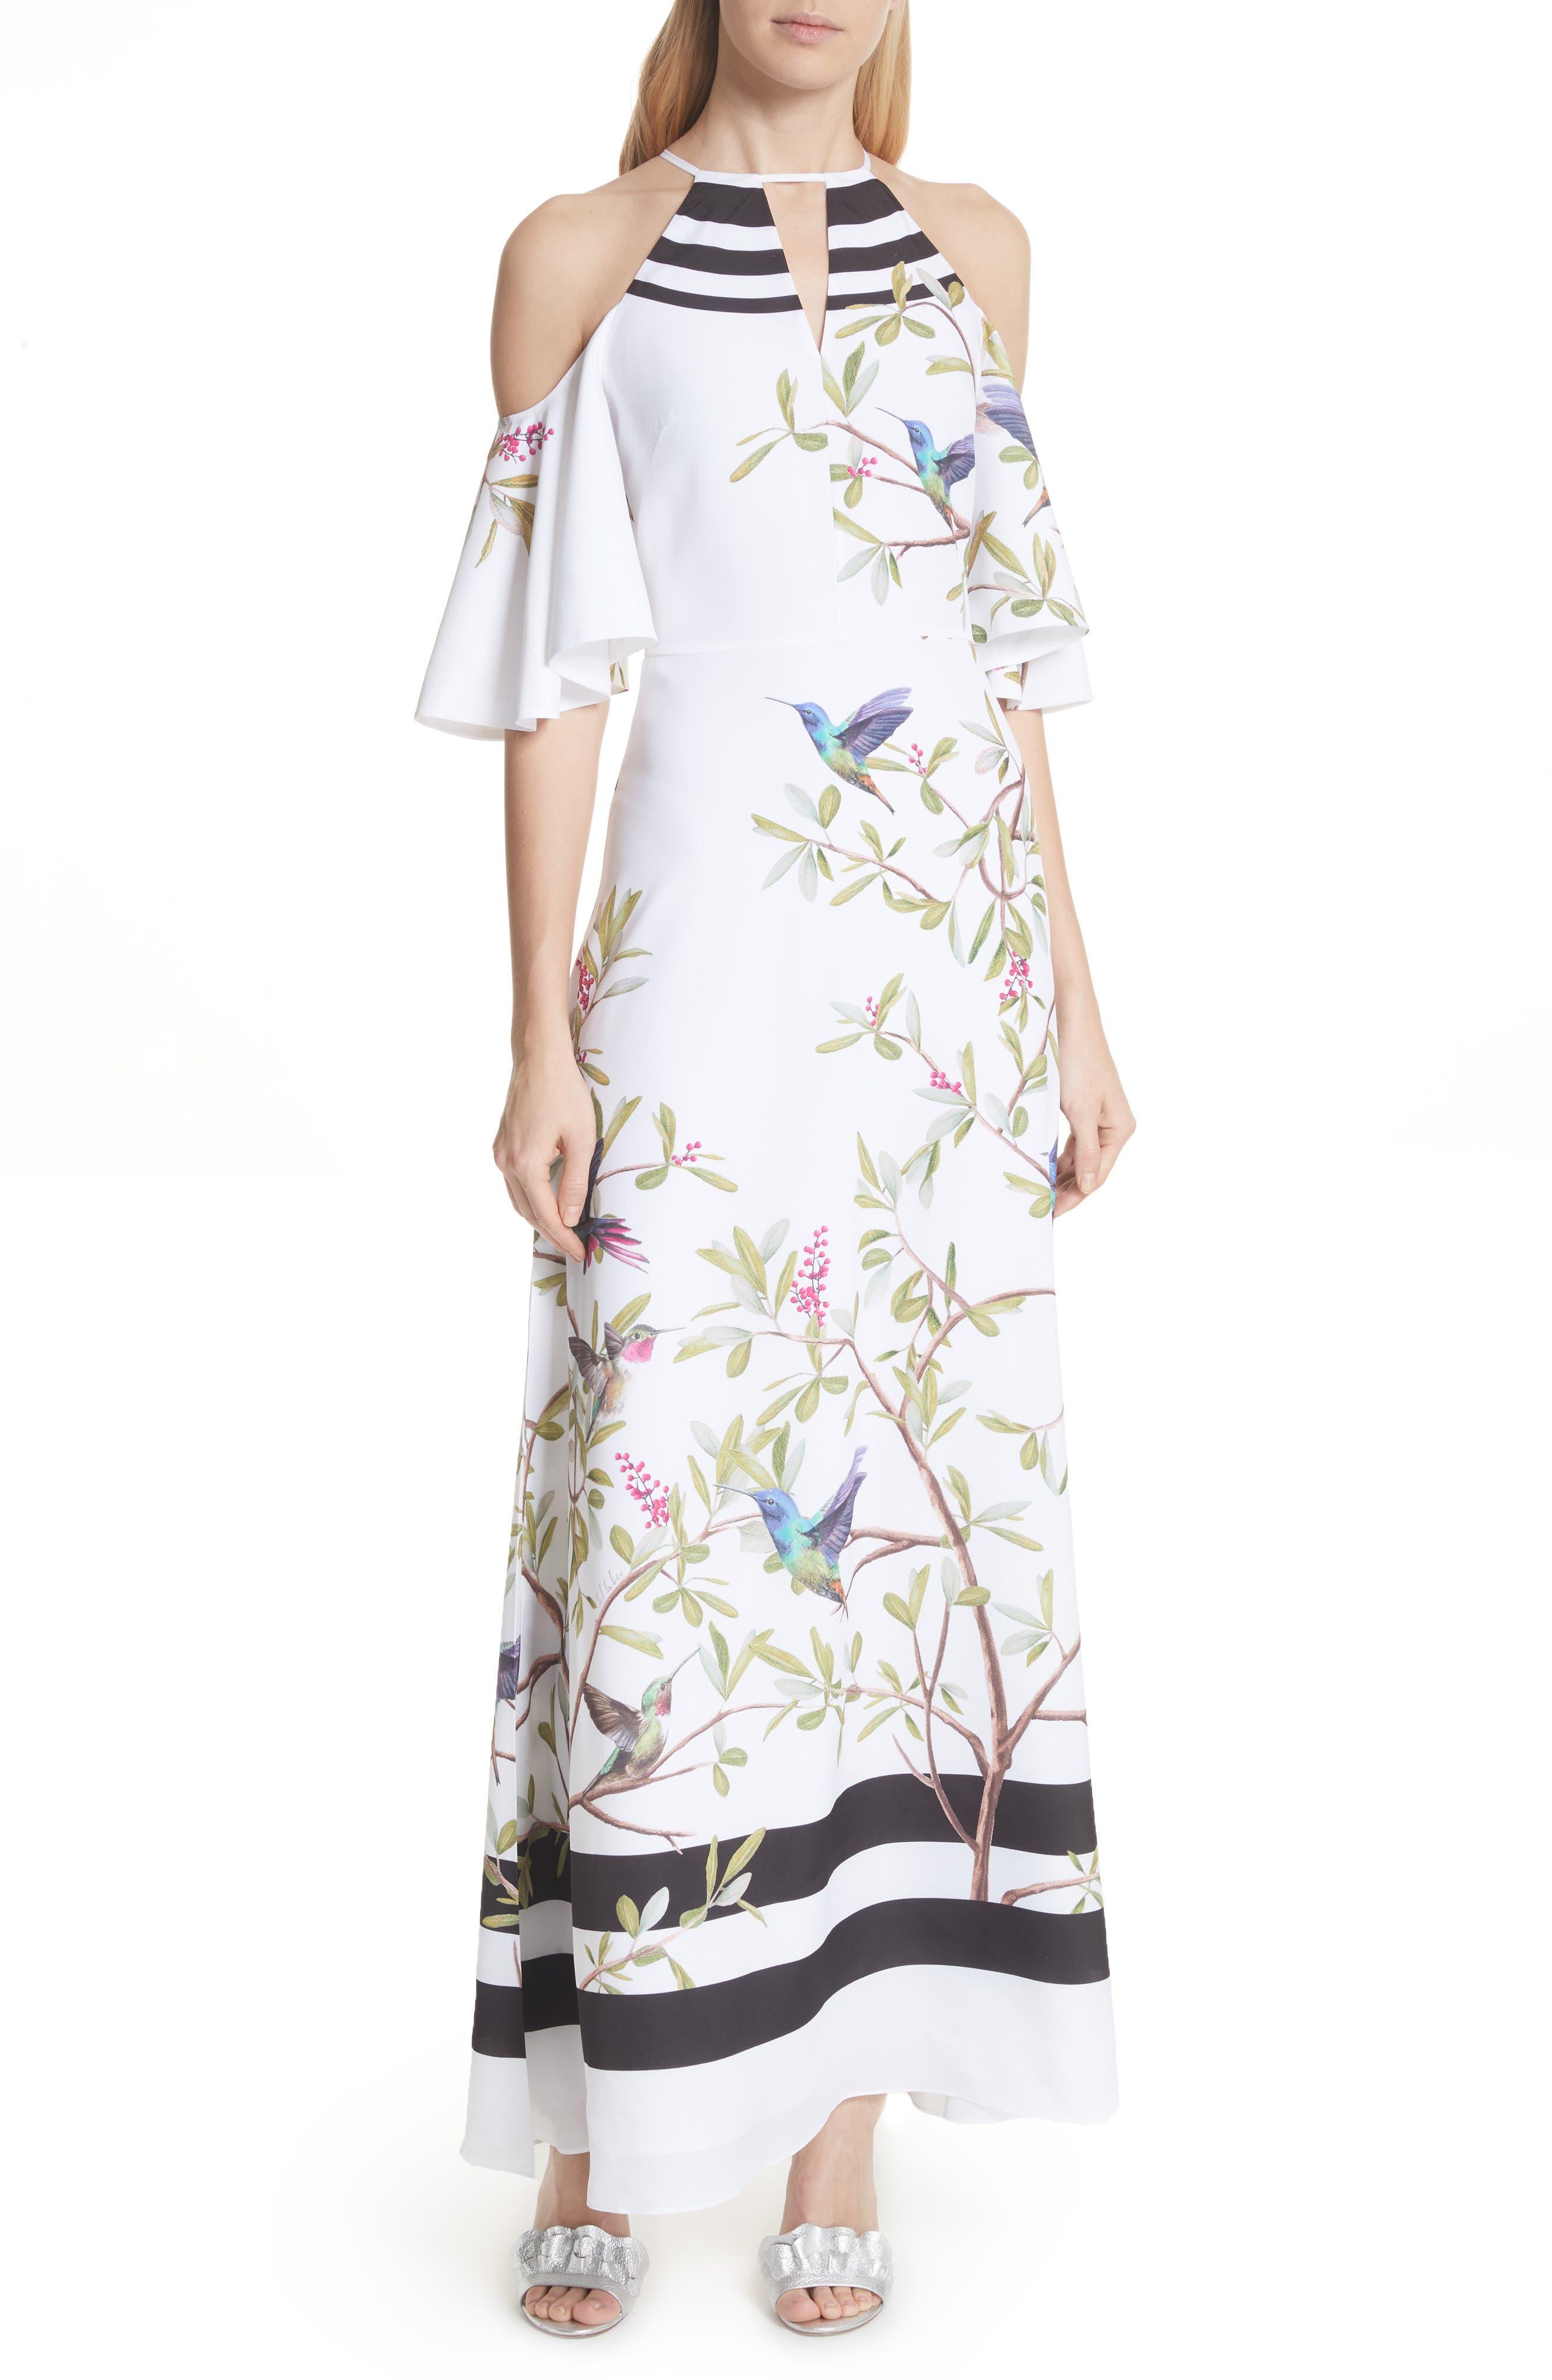 Highgrove Cold Shoulder Maxi Dress,                             Main thumbnail 1, color,                             110